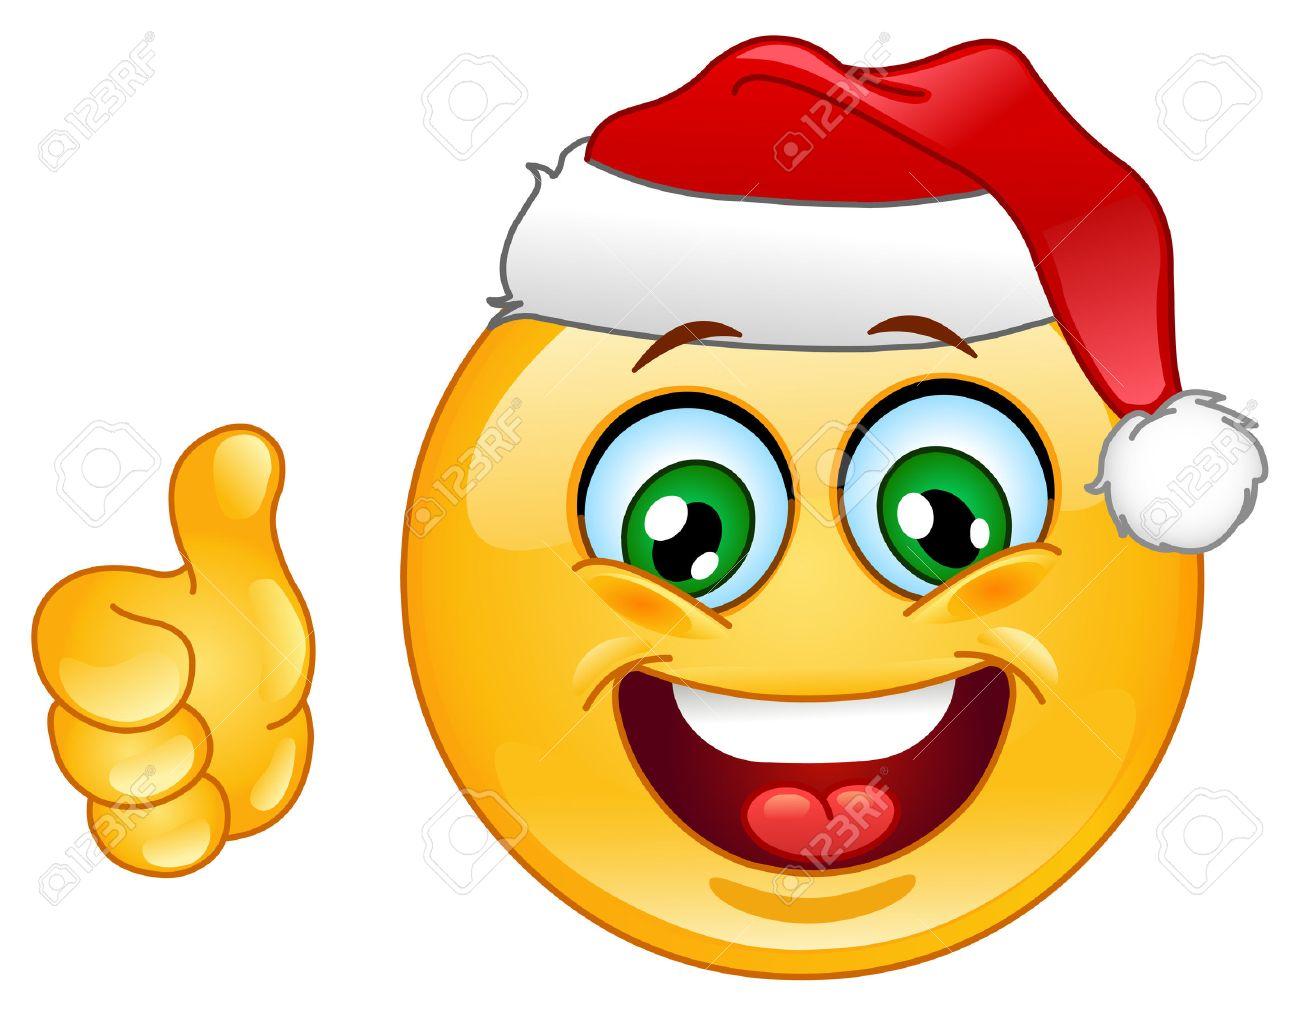 http://previews.123rf.com/images/yayayoy/yayayoy1011/yayayoy101100028/8266378-Christmas-emoticon-with-thumb-up-Stock-Photo.jpg